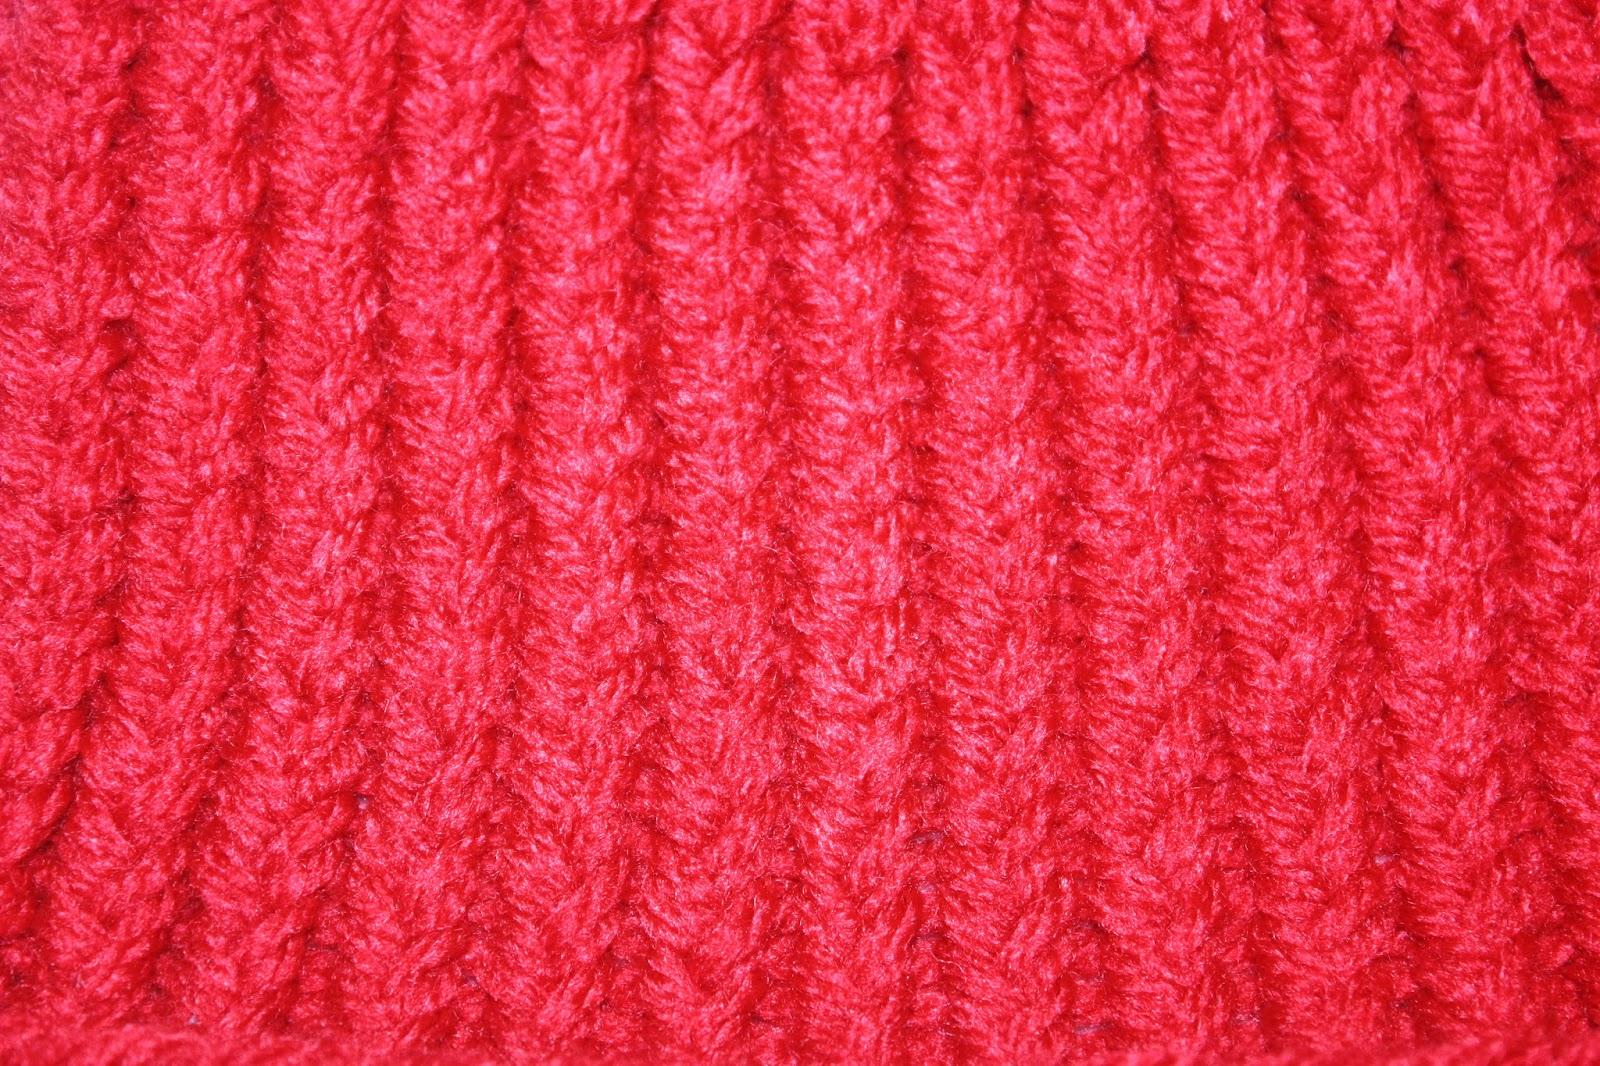 Breiring; Breiraam; Breien; Steek; Steken; Breisteek; Breisteken; Recht; dubbele steek; 1-over-2-steek; Loom; knitting; Makkelijk; Beginner; Eenvoudig; Hobby; Hoe